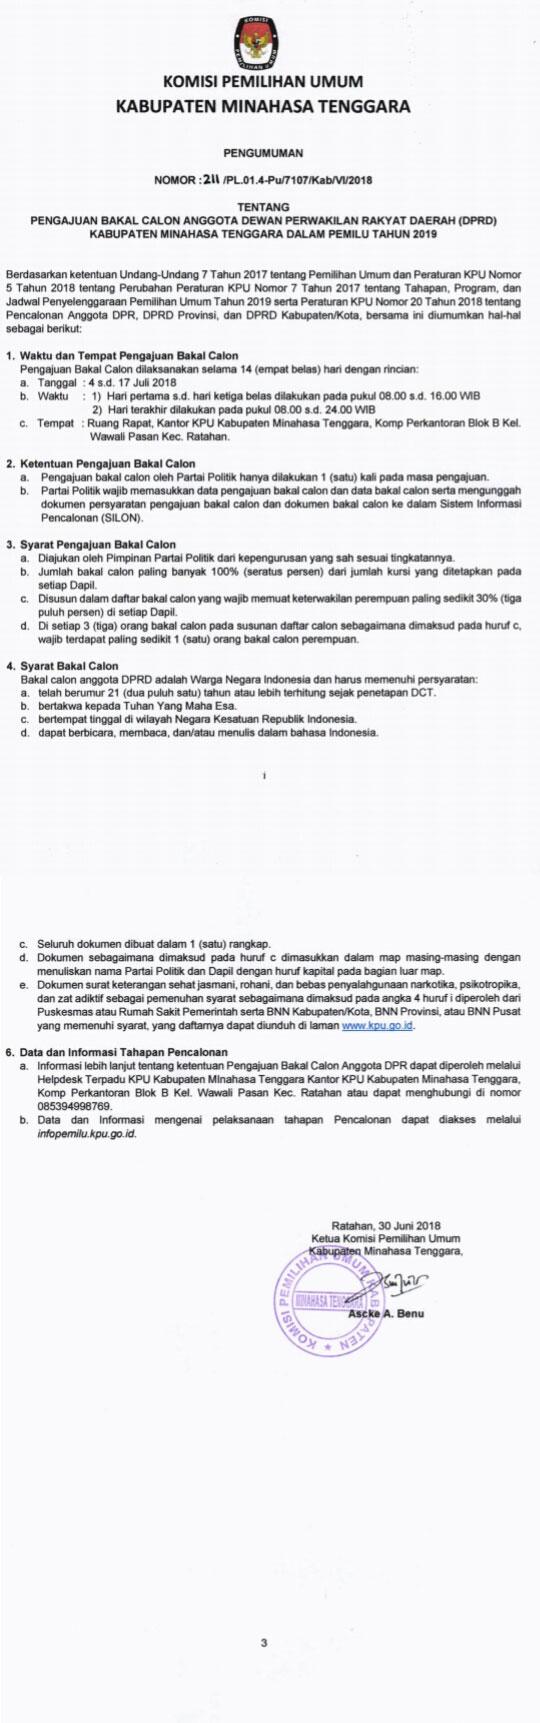 Pengumuman Komisi Pemilihan Umum Kabupaten Minahasa Tenggara